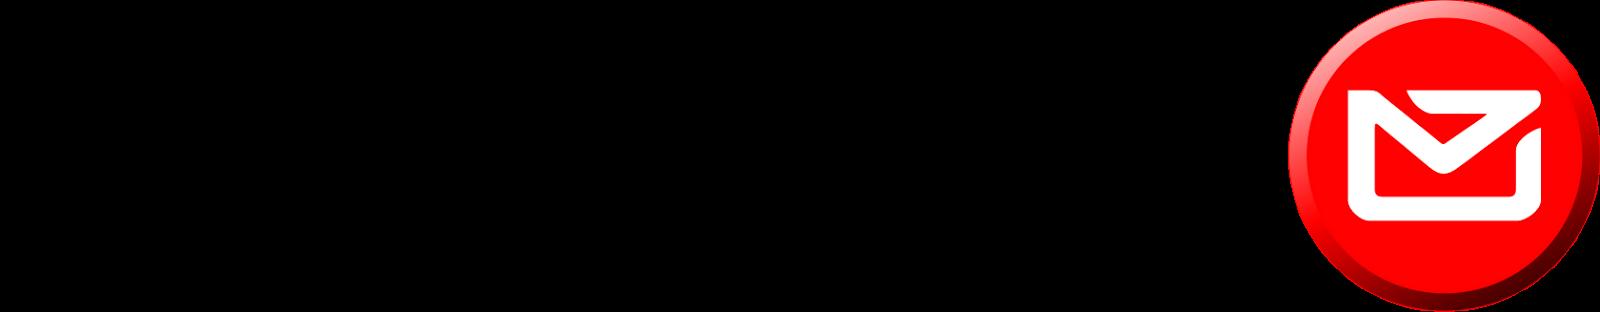 New Zealand Post Logo - Free Vector CDR - New Zealand Post Vector PNG